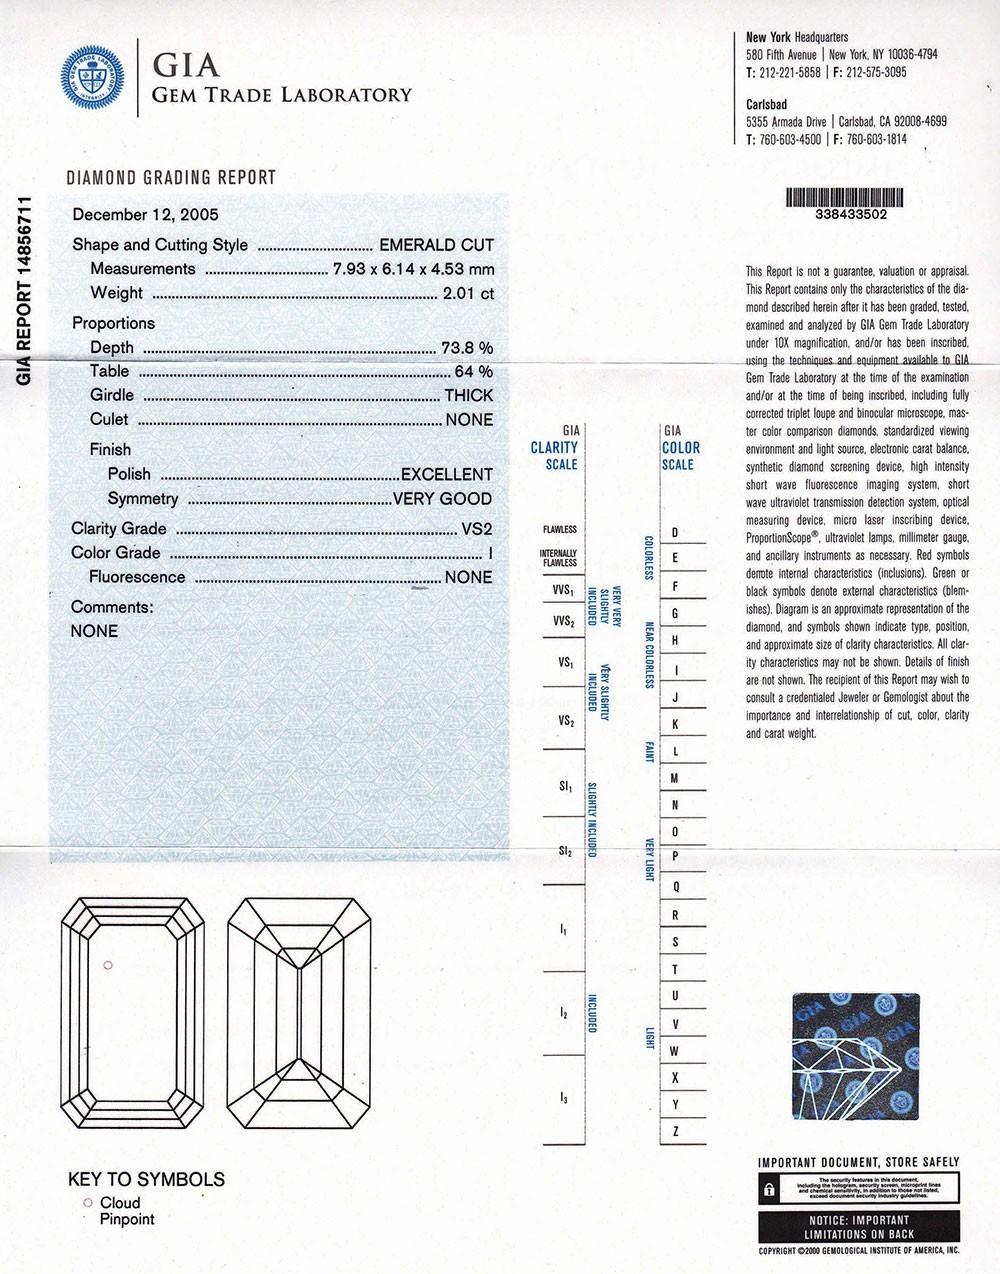 LD3008